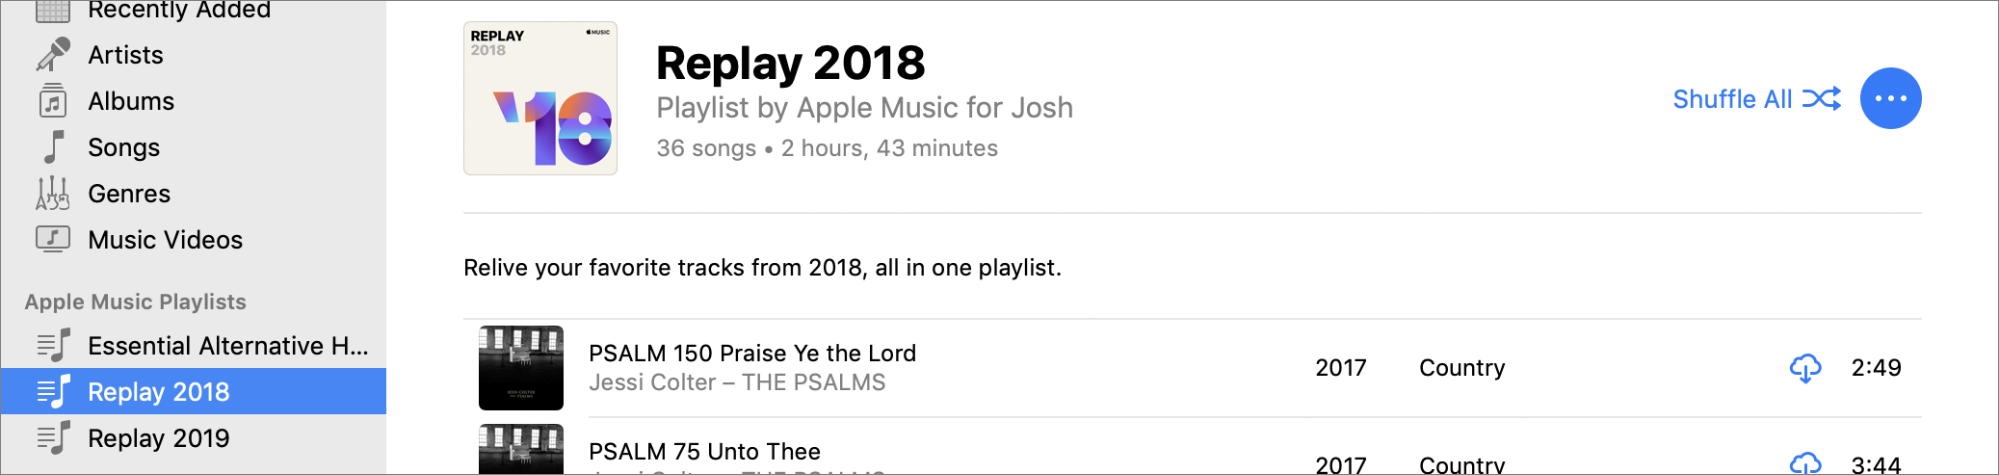 Josh's Replay 2018 playlist